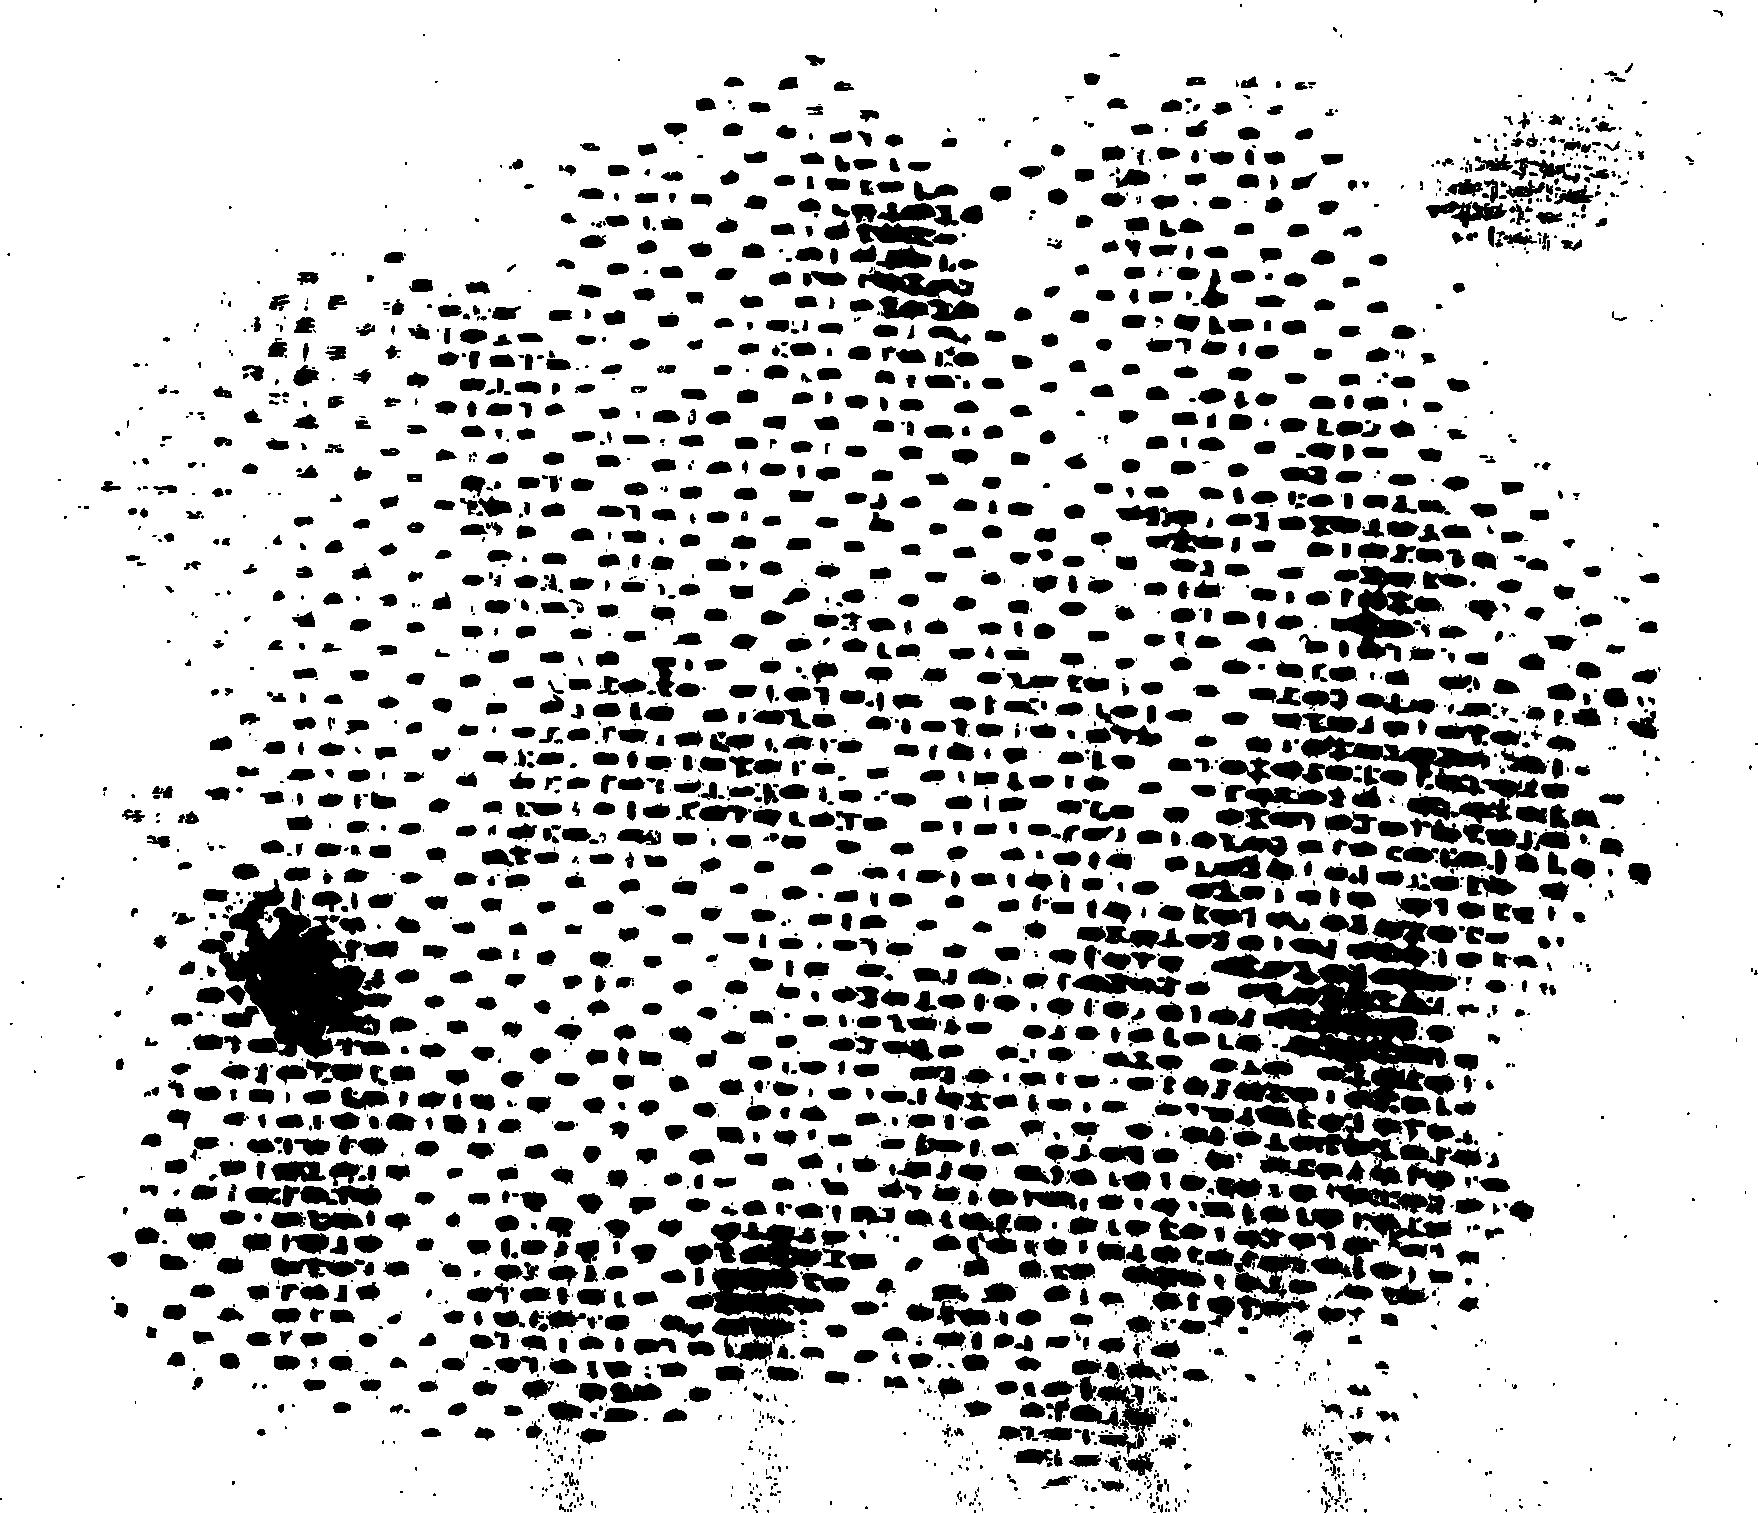 12 Grunge Overlay Texture (PNG Transparent) Vol. 2.